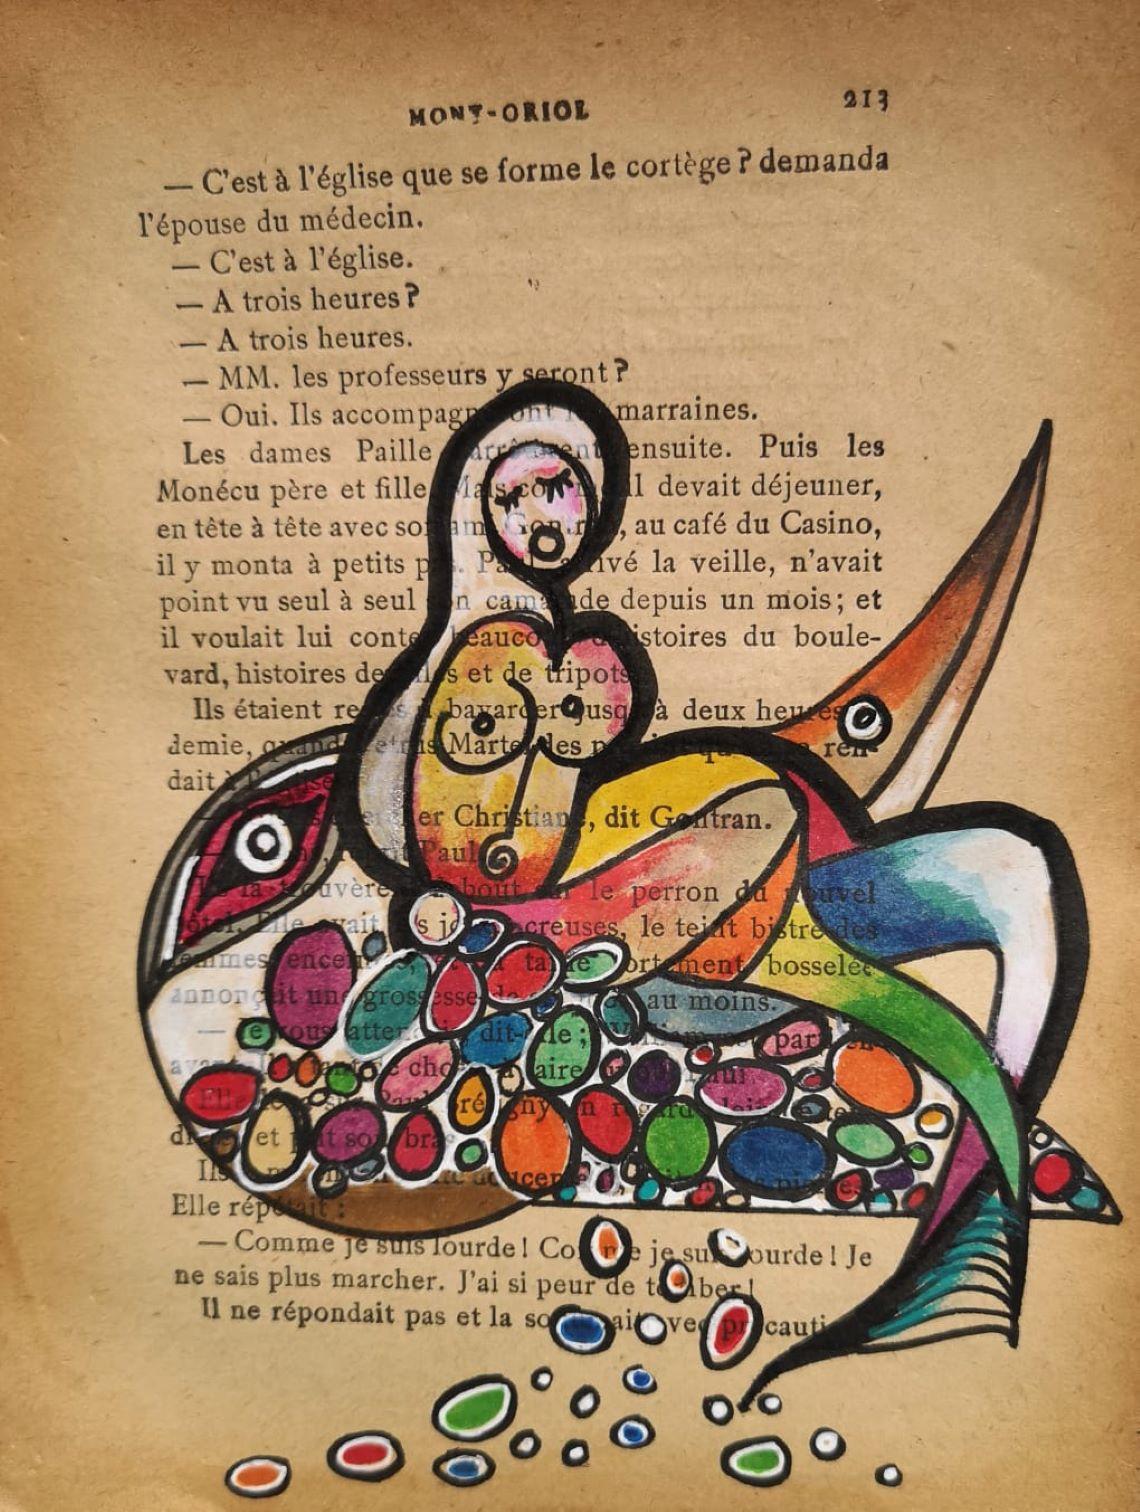 Dessin Ariane Pasco / Nice Art - érotisme